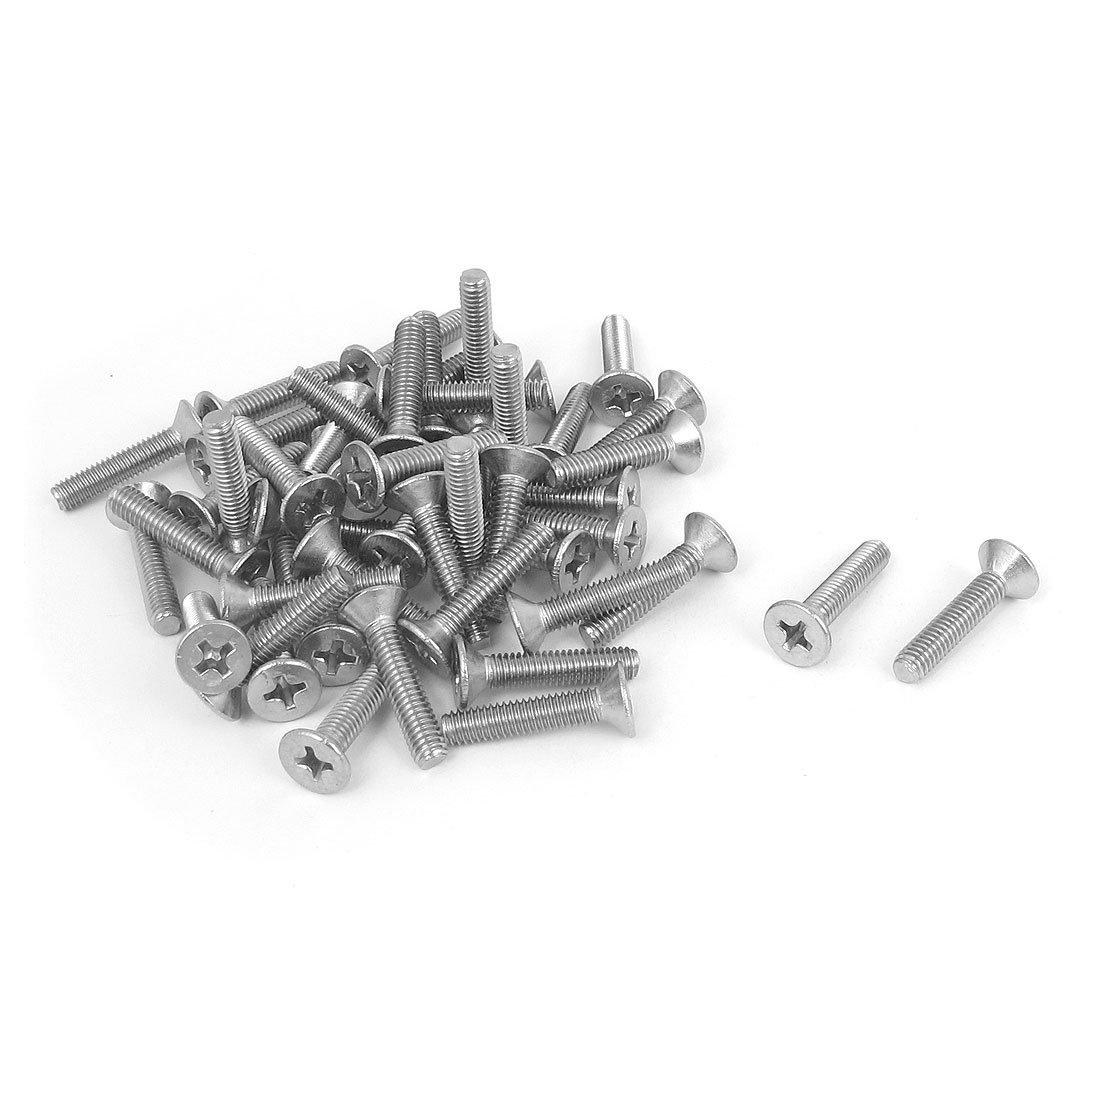 M4 x 20mm Phillips Flat Head Countersunk Bolts Machine Screws 50pcs uxcell a15101300ux0204